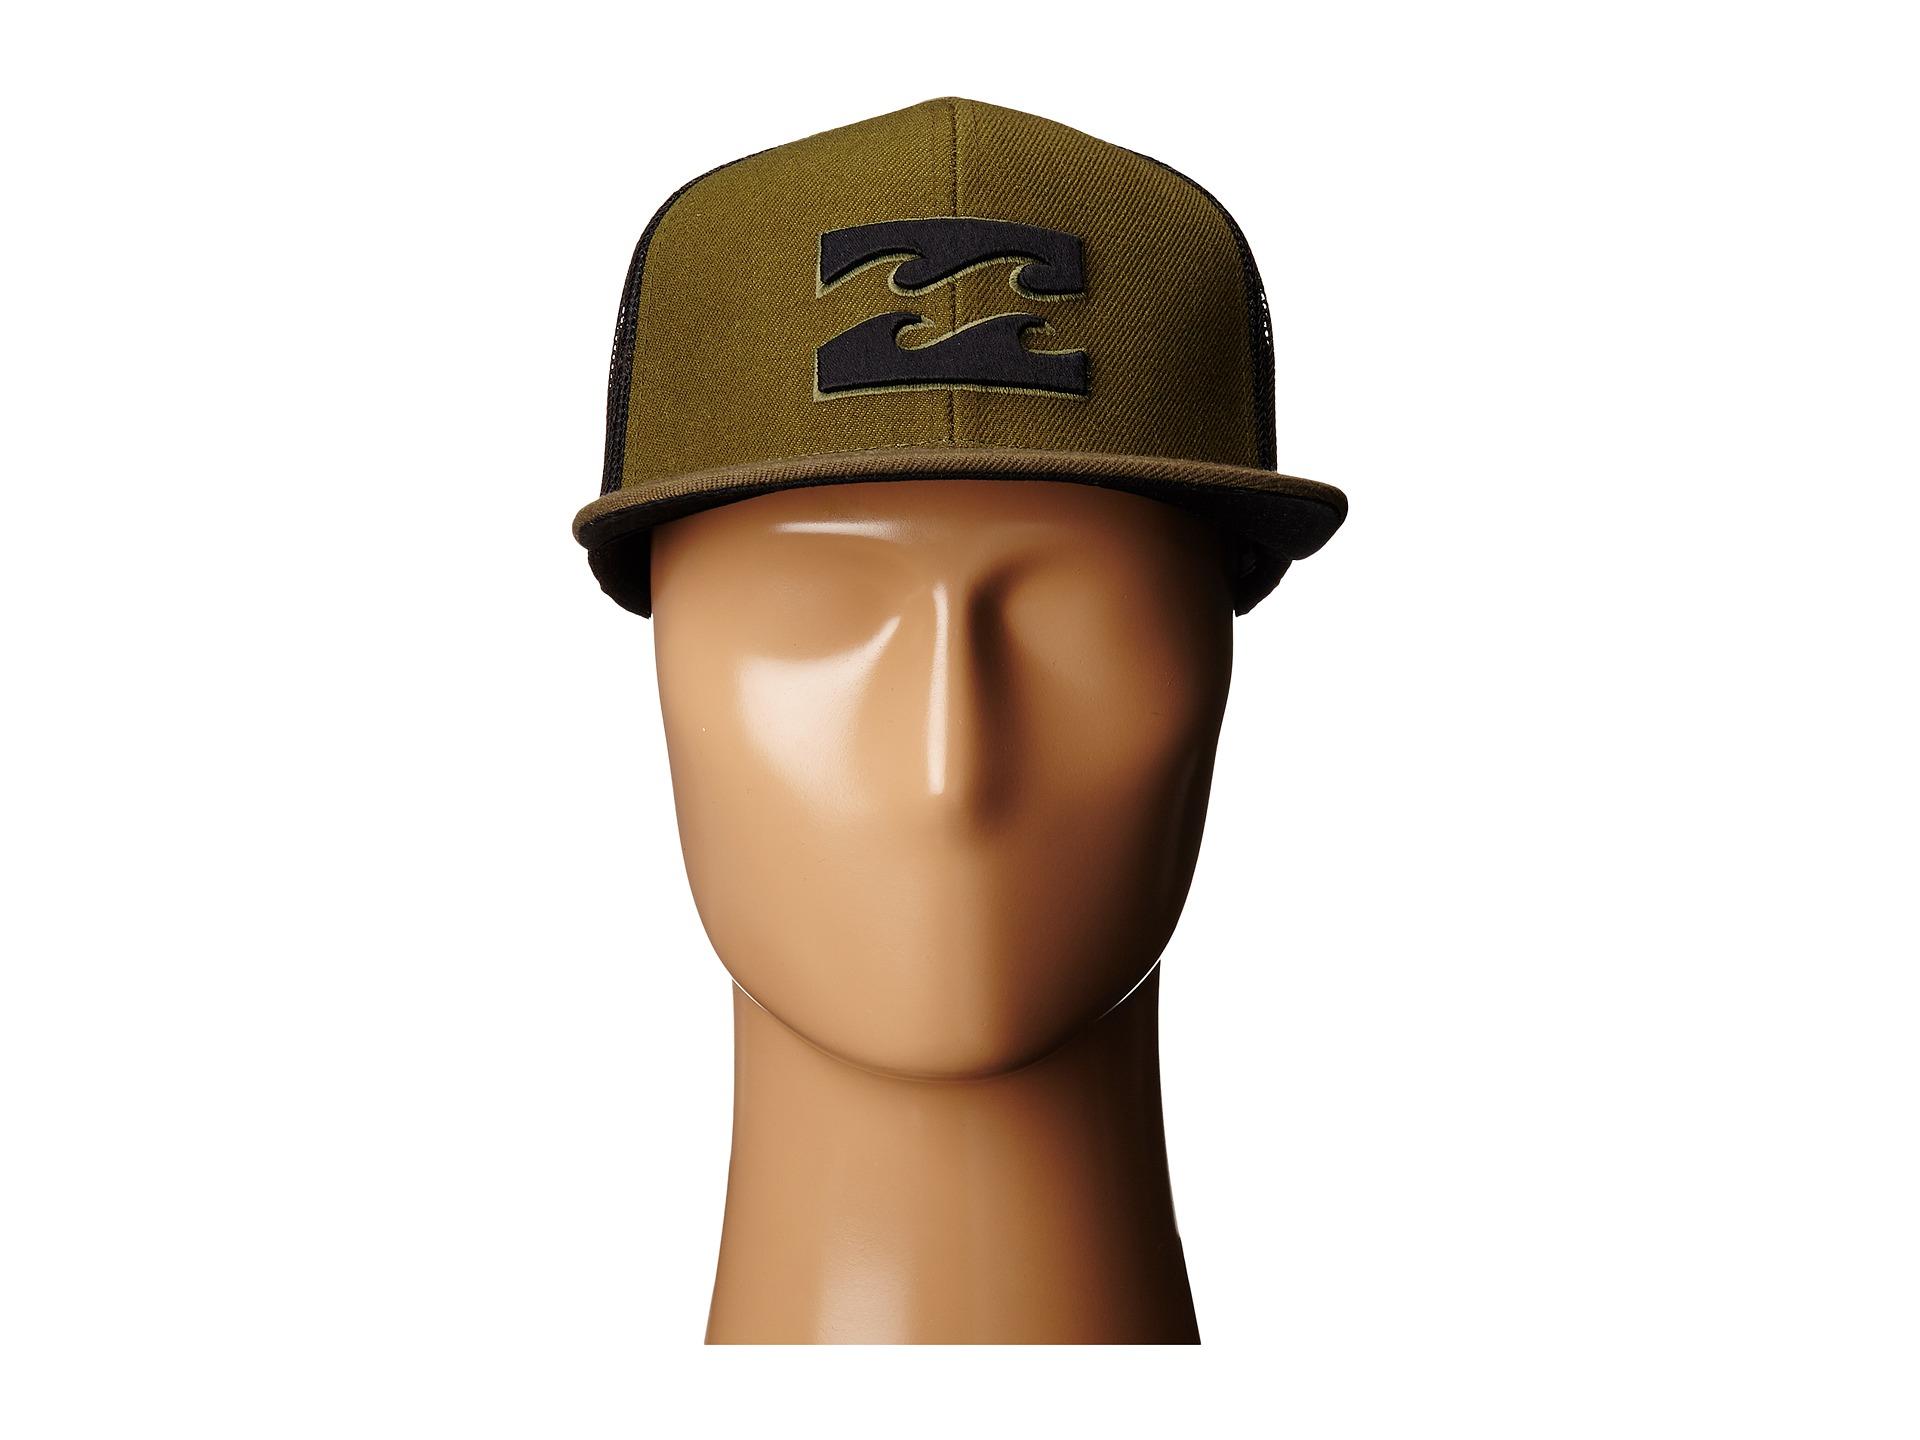 9e8028bcbc2 Lyst - Billabong All Day Trucker Hat in Green for Men